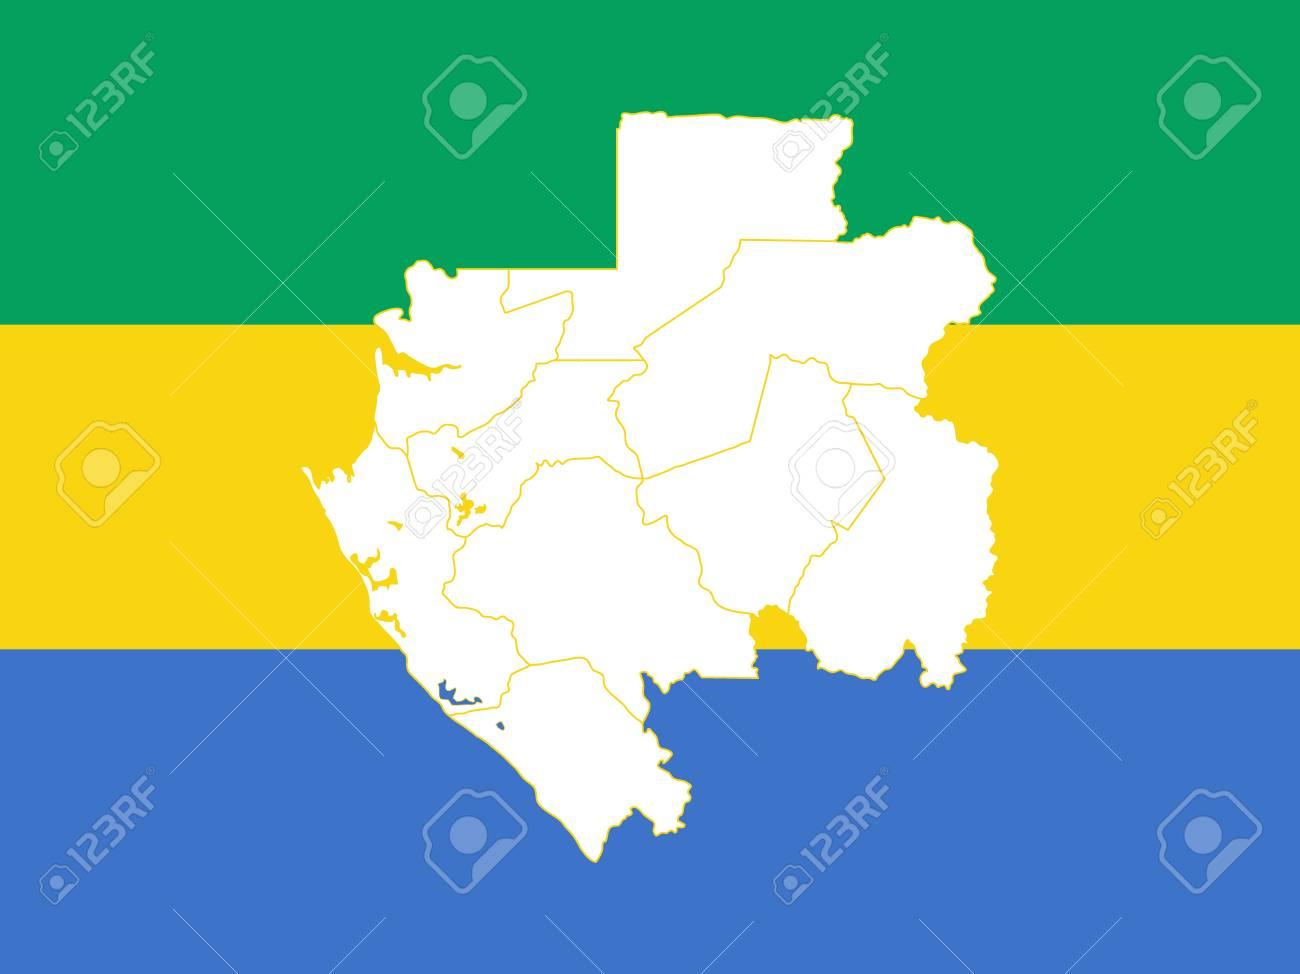 Gabon World Map.Map And Flag Of Gabon Vector Illustration World Map Royalty Free